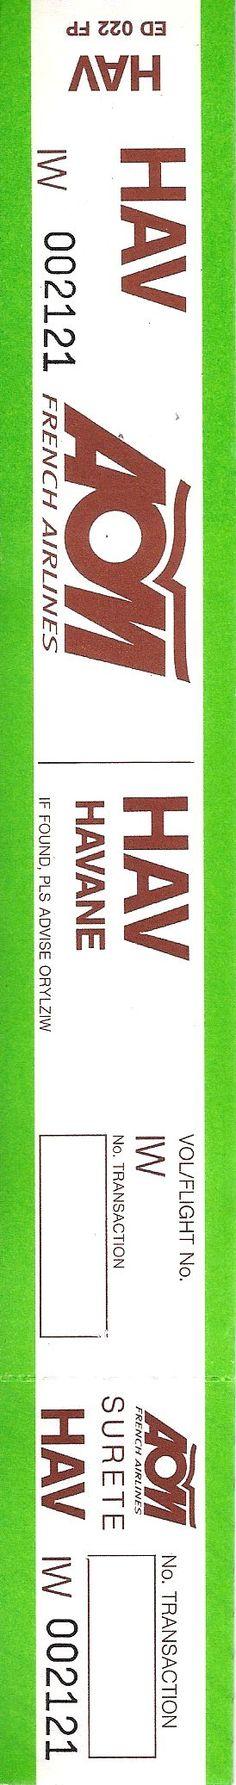 Aom French Airline HAV - La Havane Luggage Tag